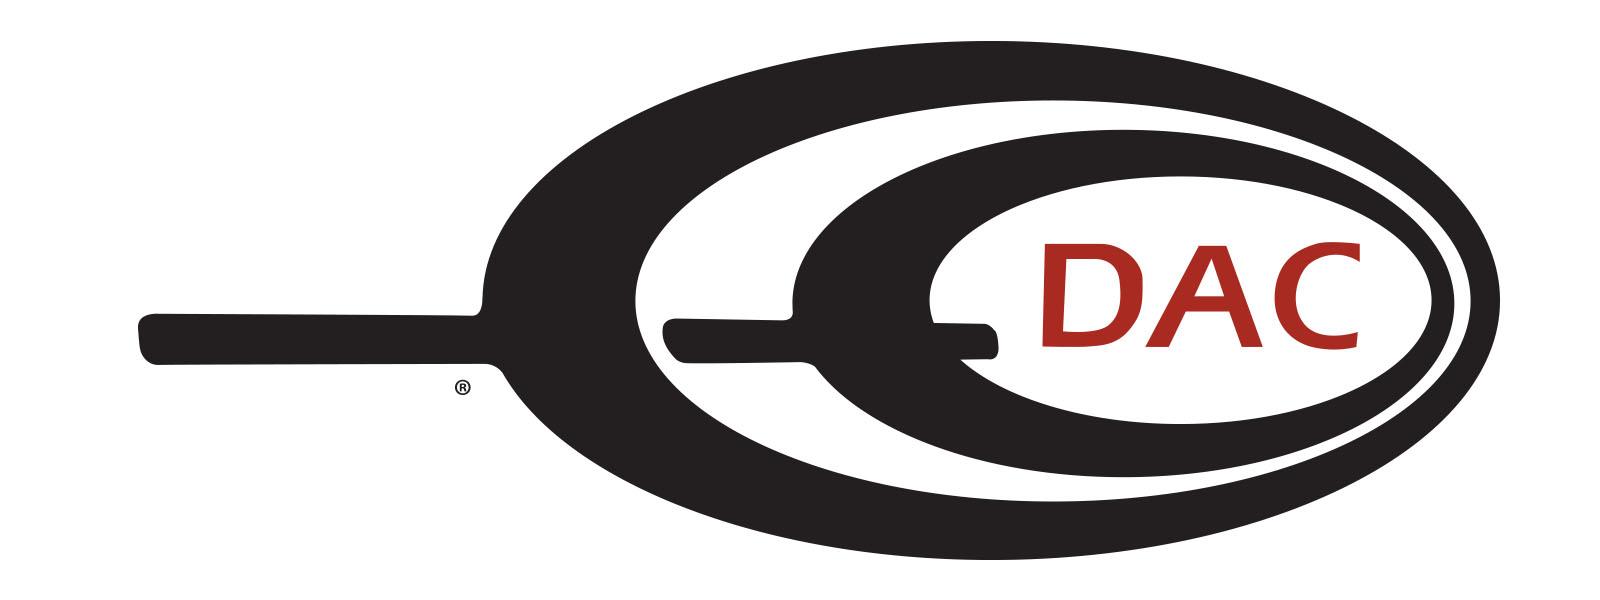 logotipo DAC